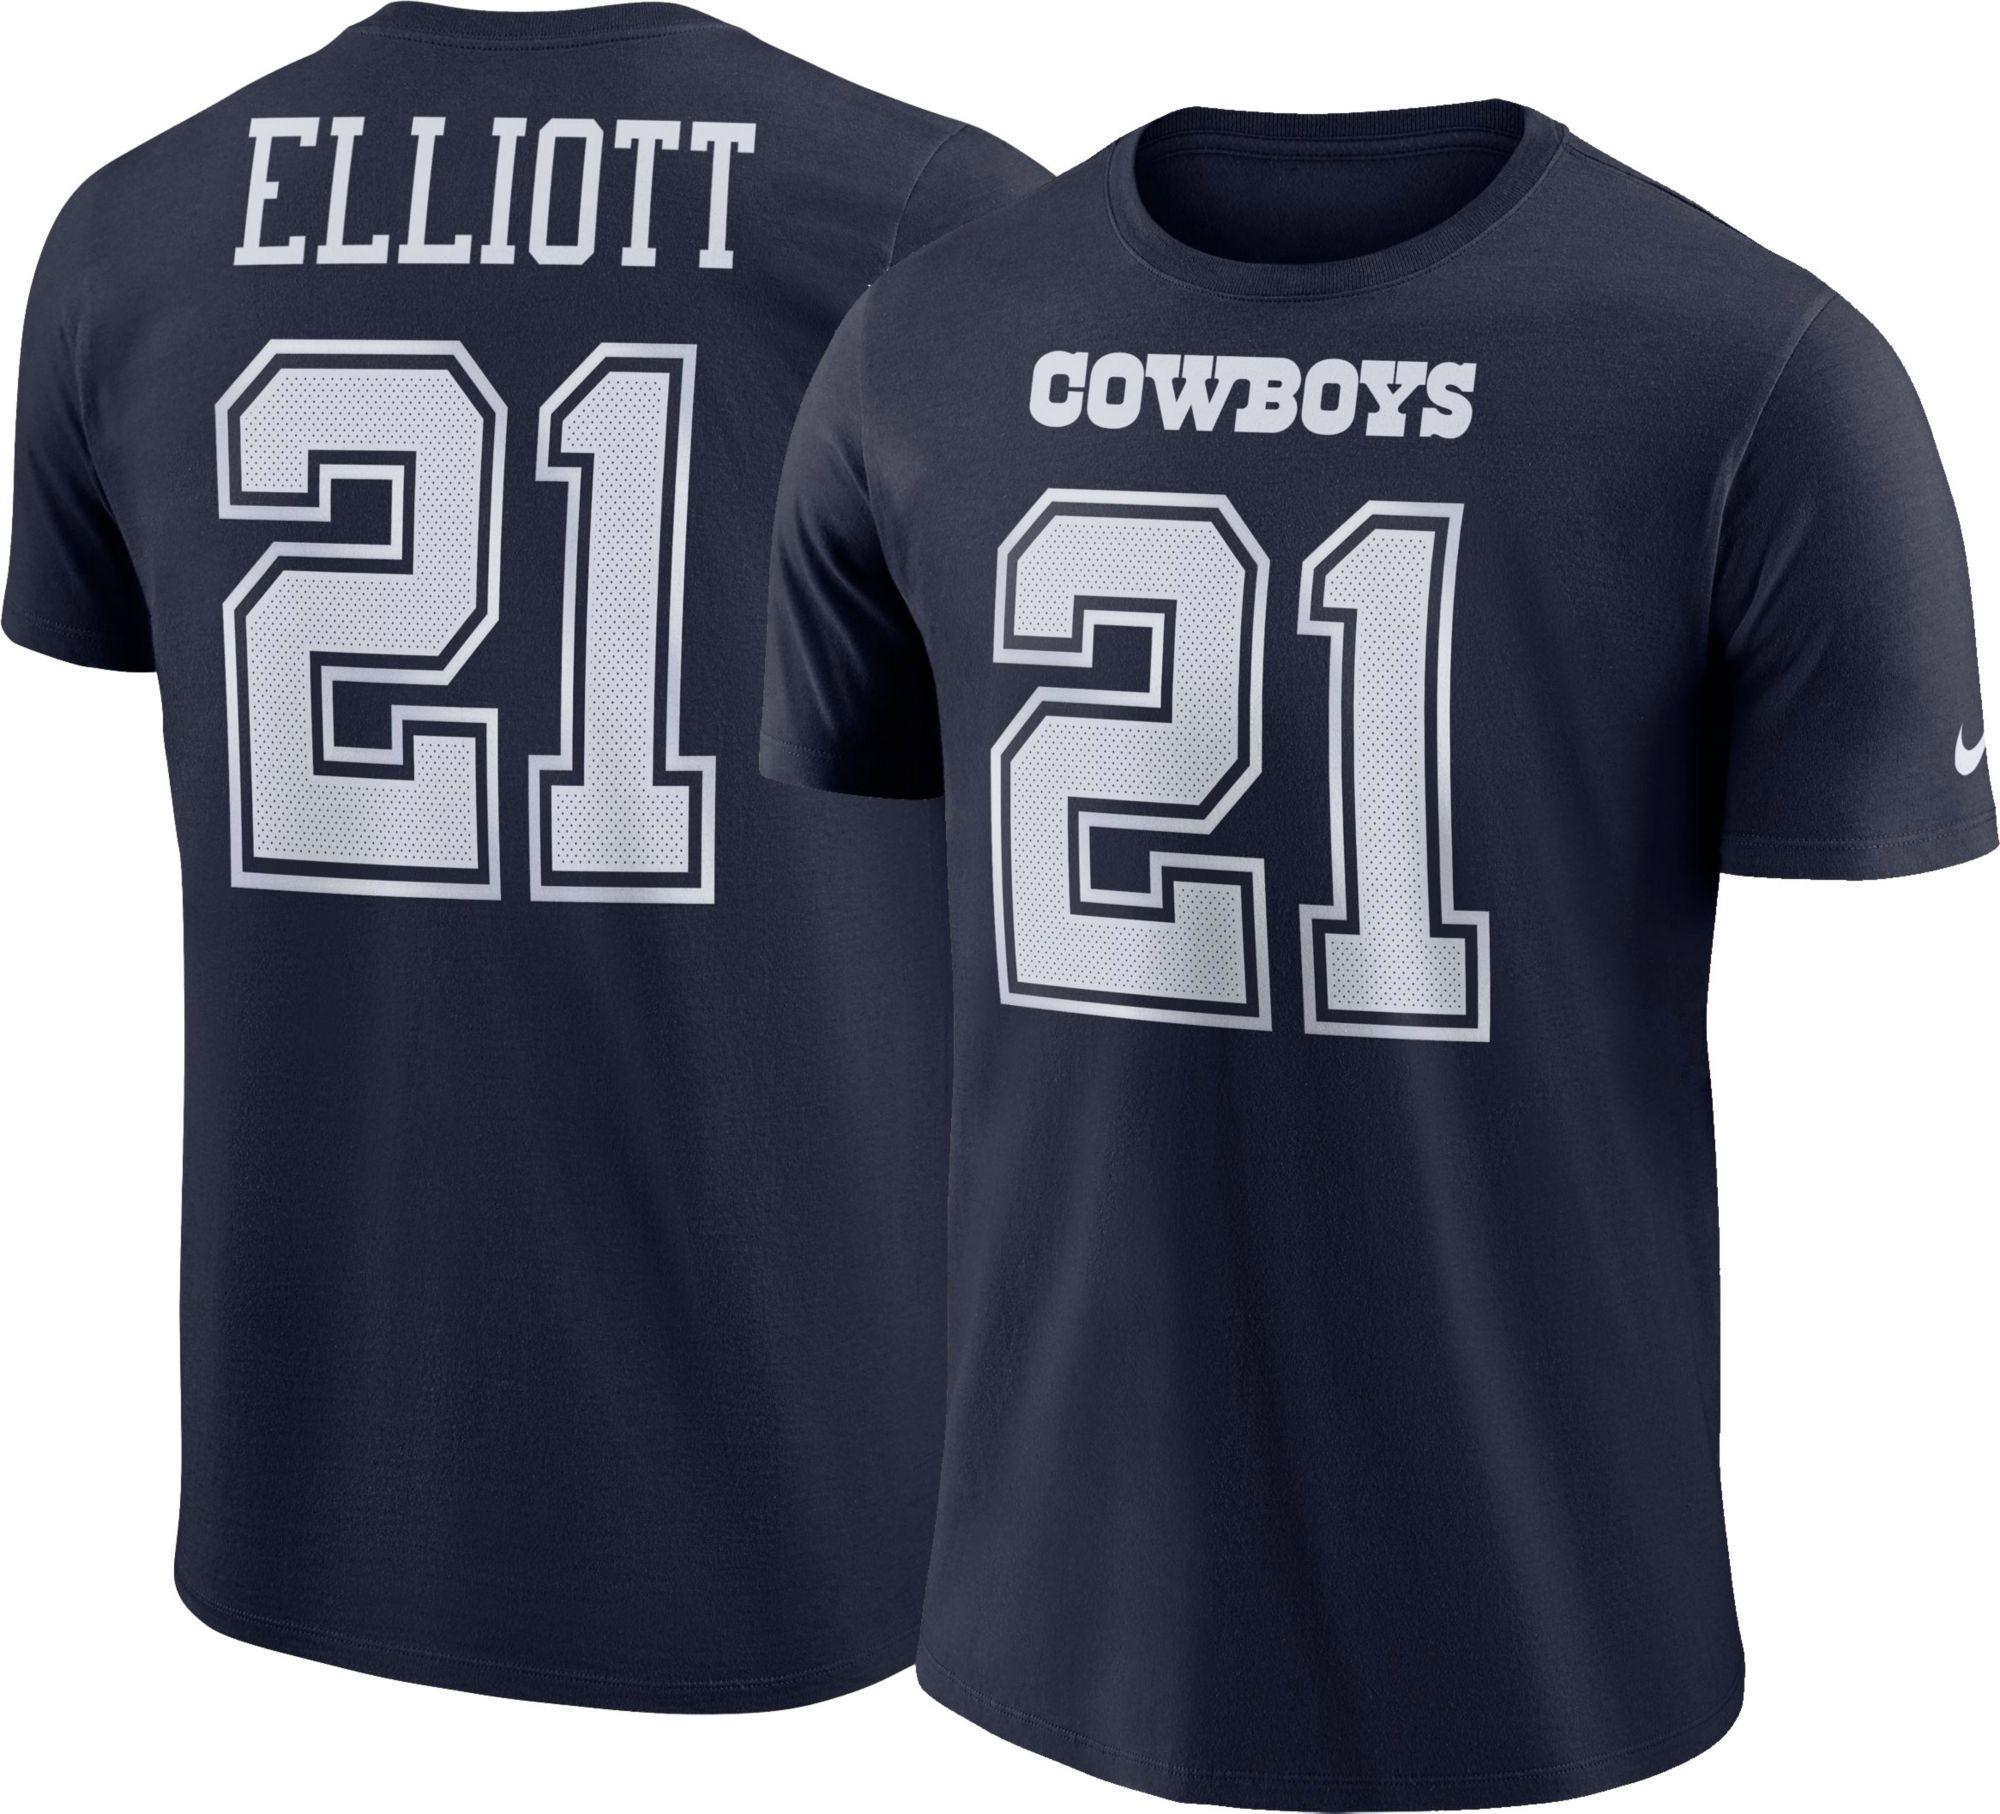 6d7c7e1cd ... limited gridiron jerseys official 6498e 7f7d5; clearance nike mens  dallas cowboys ezekiel elliott 21 pride navy t shirt fbe7a 8b6d9